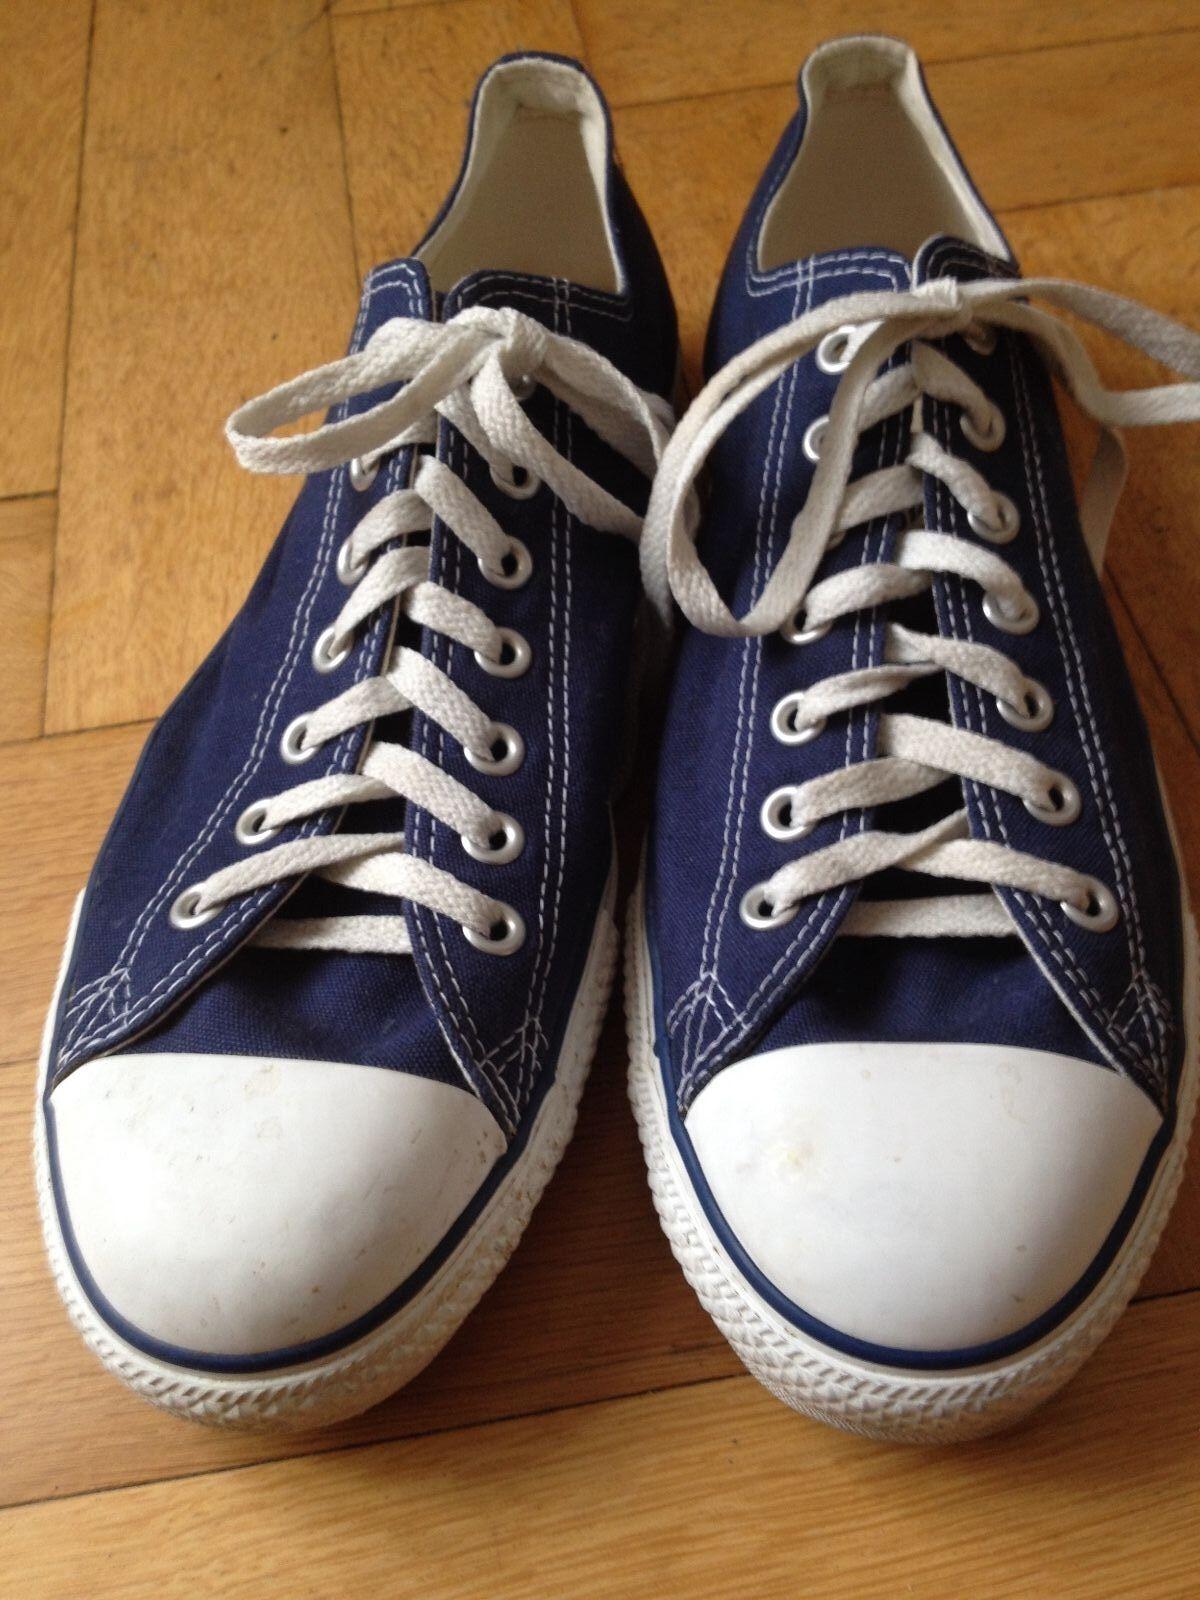 CONVERSE SNEAKER VINTAGE ATHLETIC PLIMSOLLS BLUE WHITE EUR 45 US 11.5 UK10.5